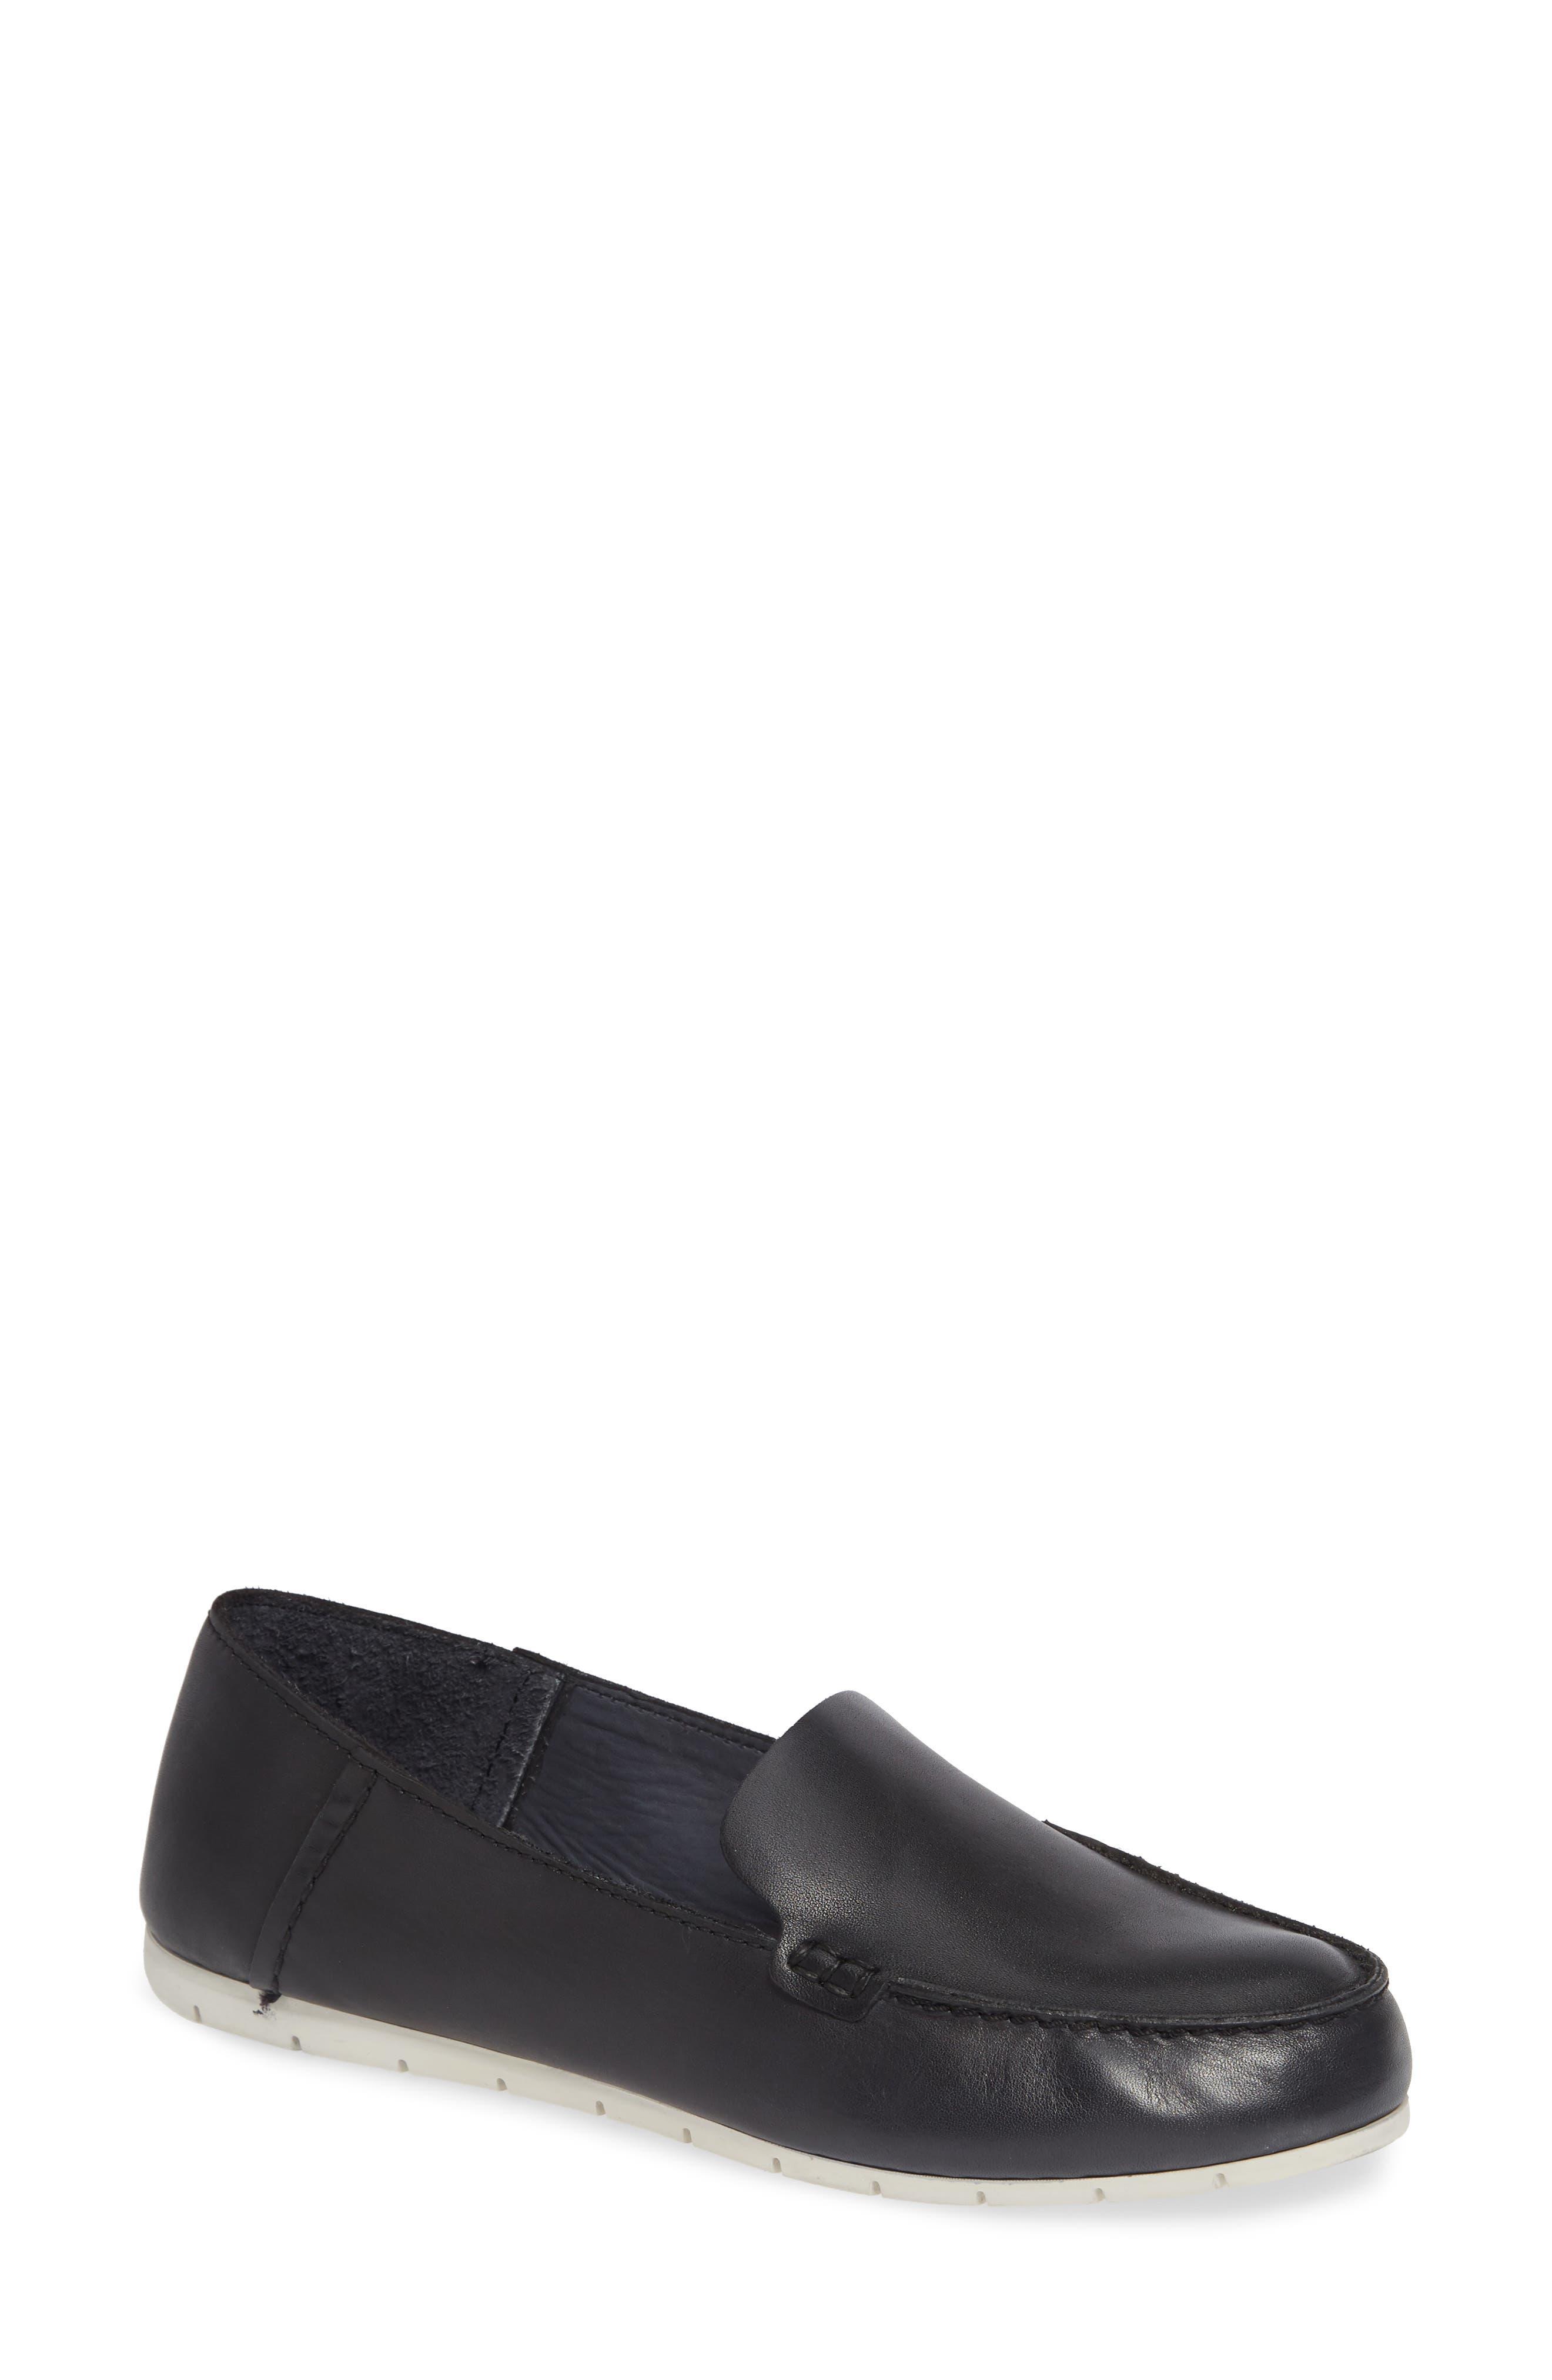 Sedona Venetian Loafer,                             Main thumbnail 1, color,                             BLACK LEATHER